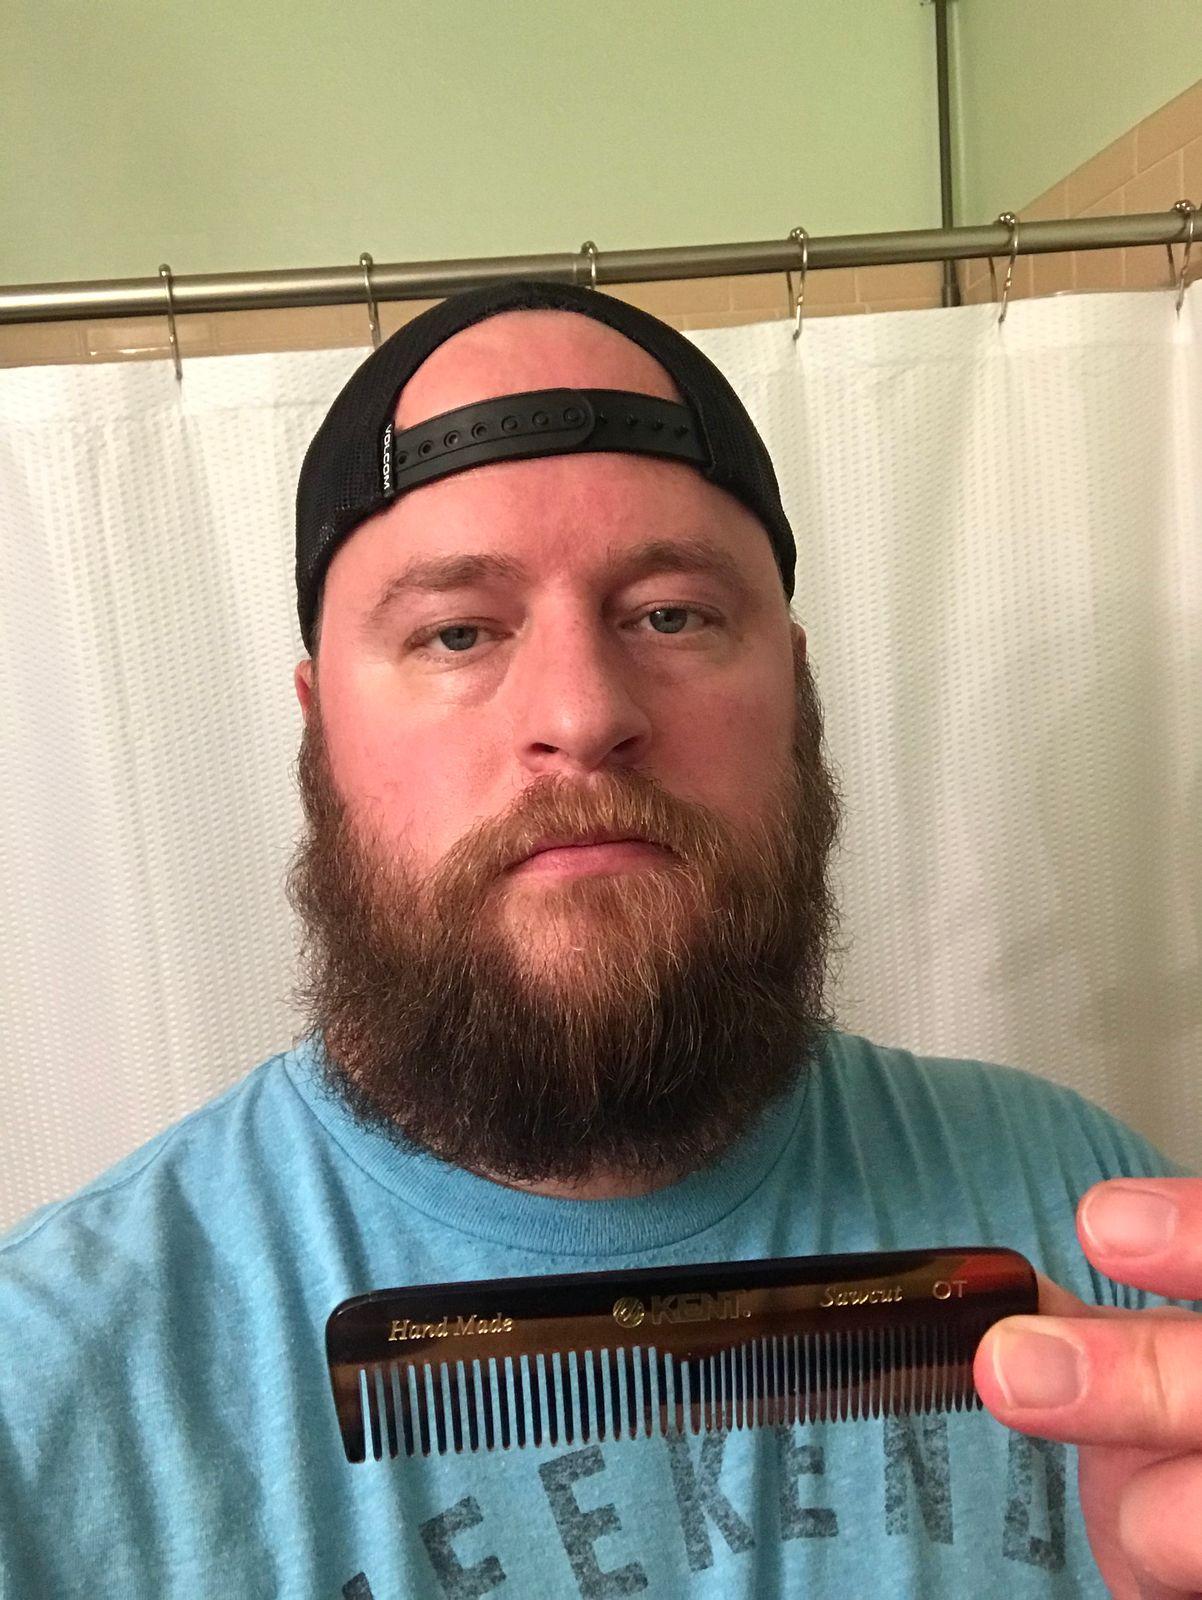 Kent Pocket Beard Comb